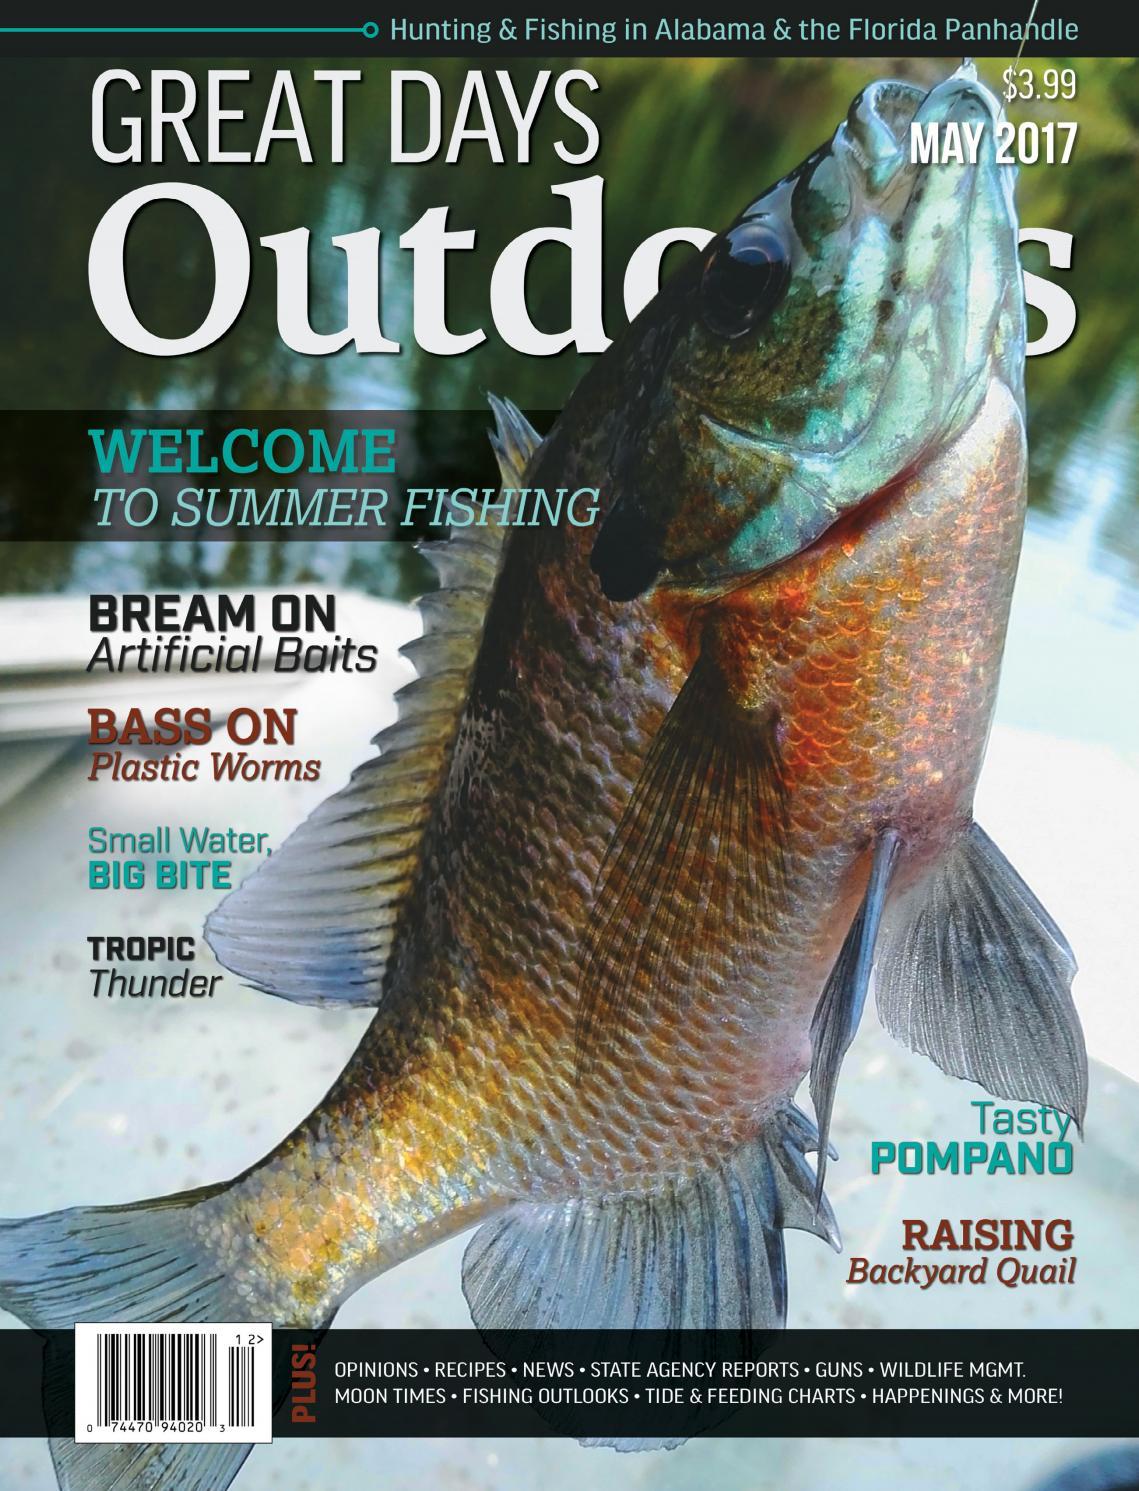 Ozark Trail 2 Piece Set Bass Fishing Long A Jerkbait Crankbait Blue /& Chart